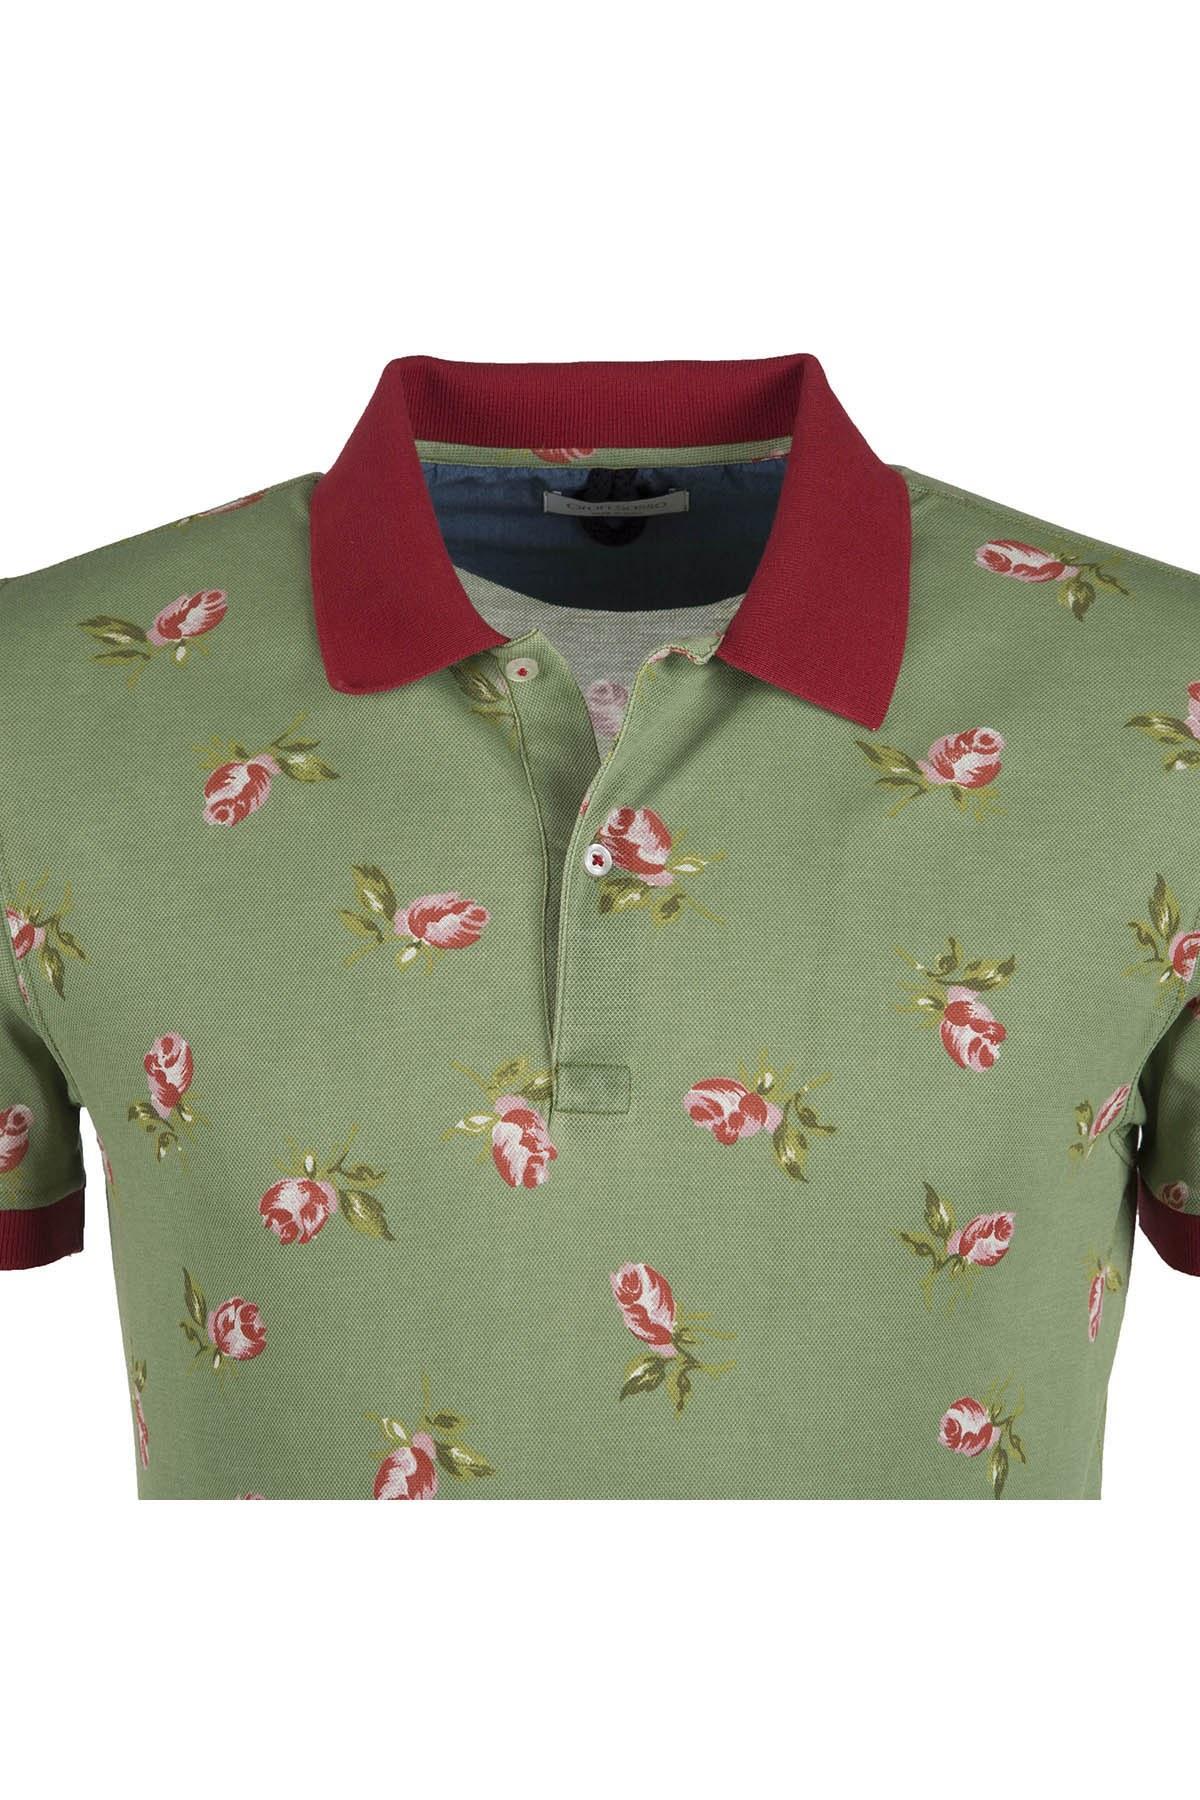 GRAN SASSO T SHIRT Erkek T Shirt 6016366801470 YEŞİL